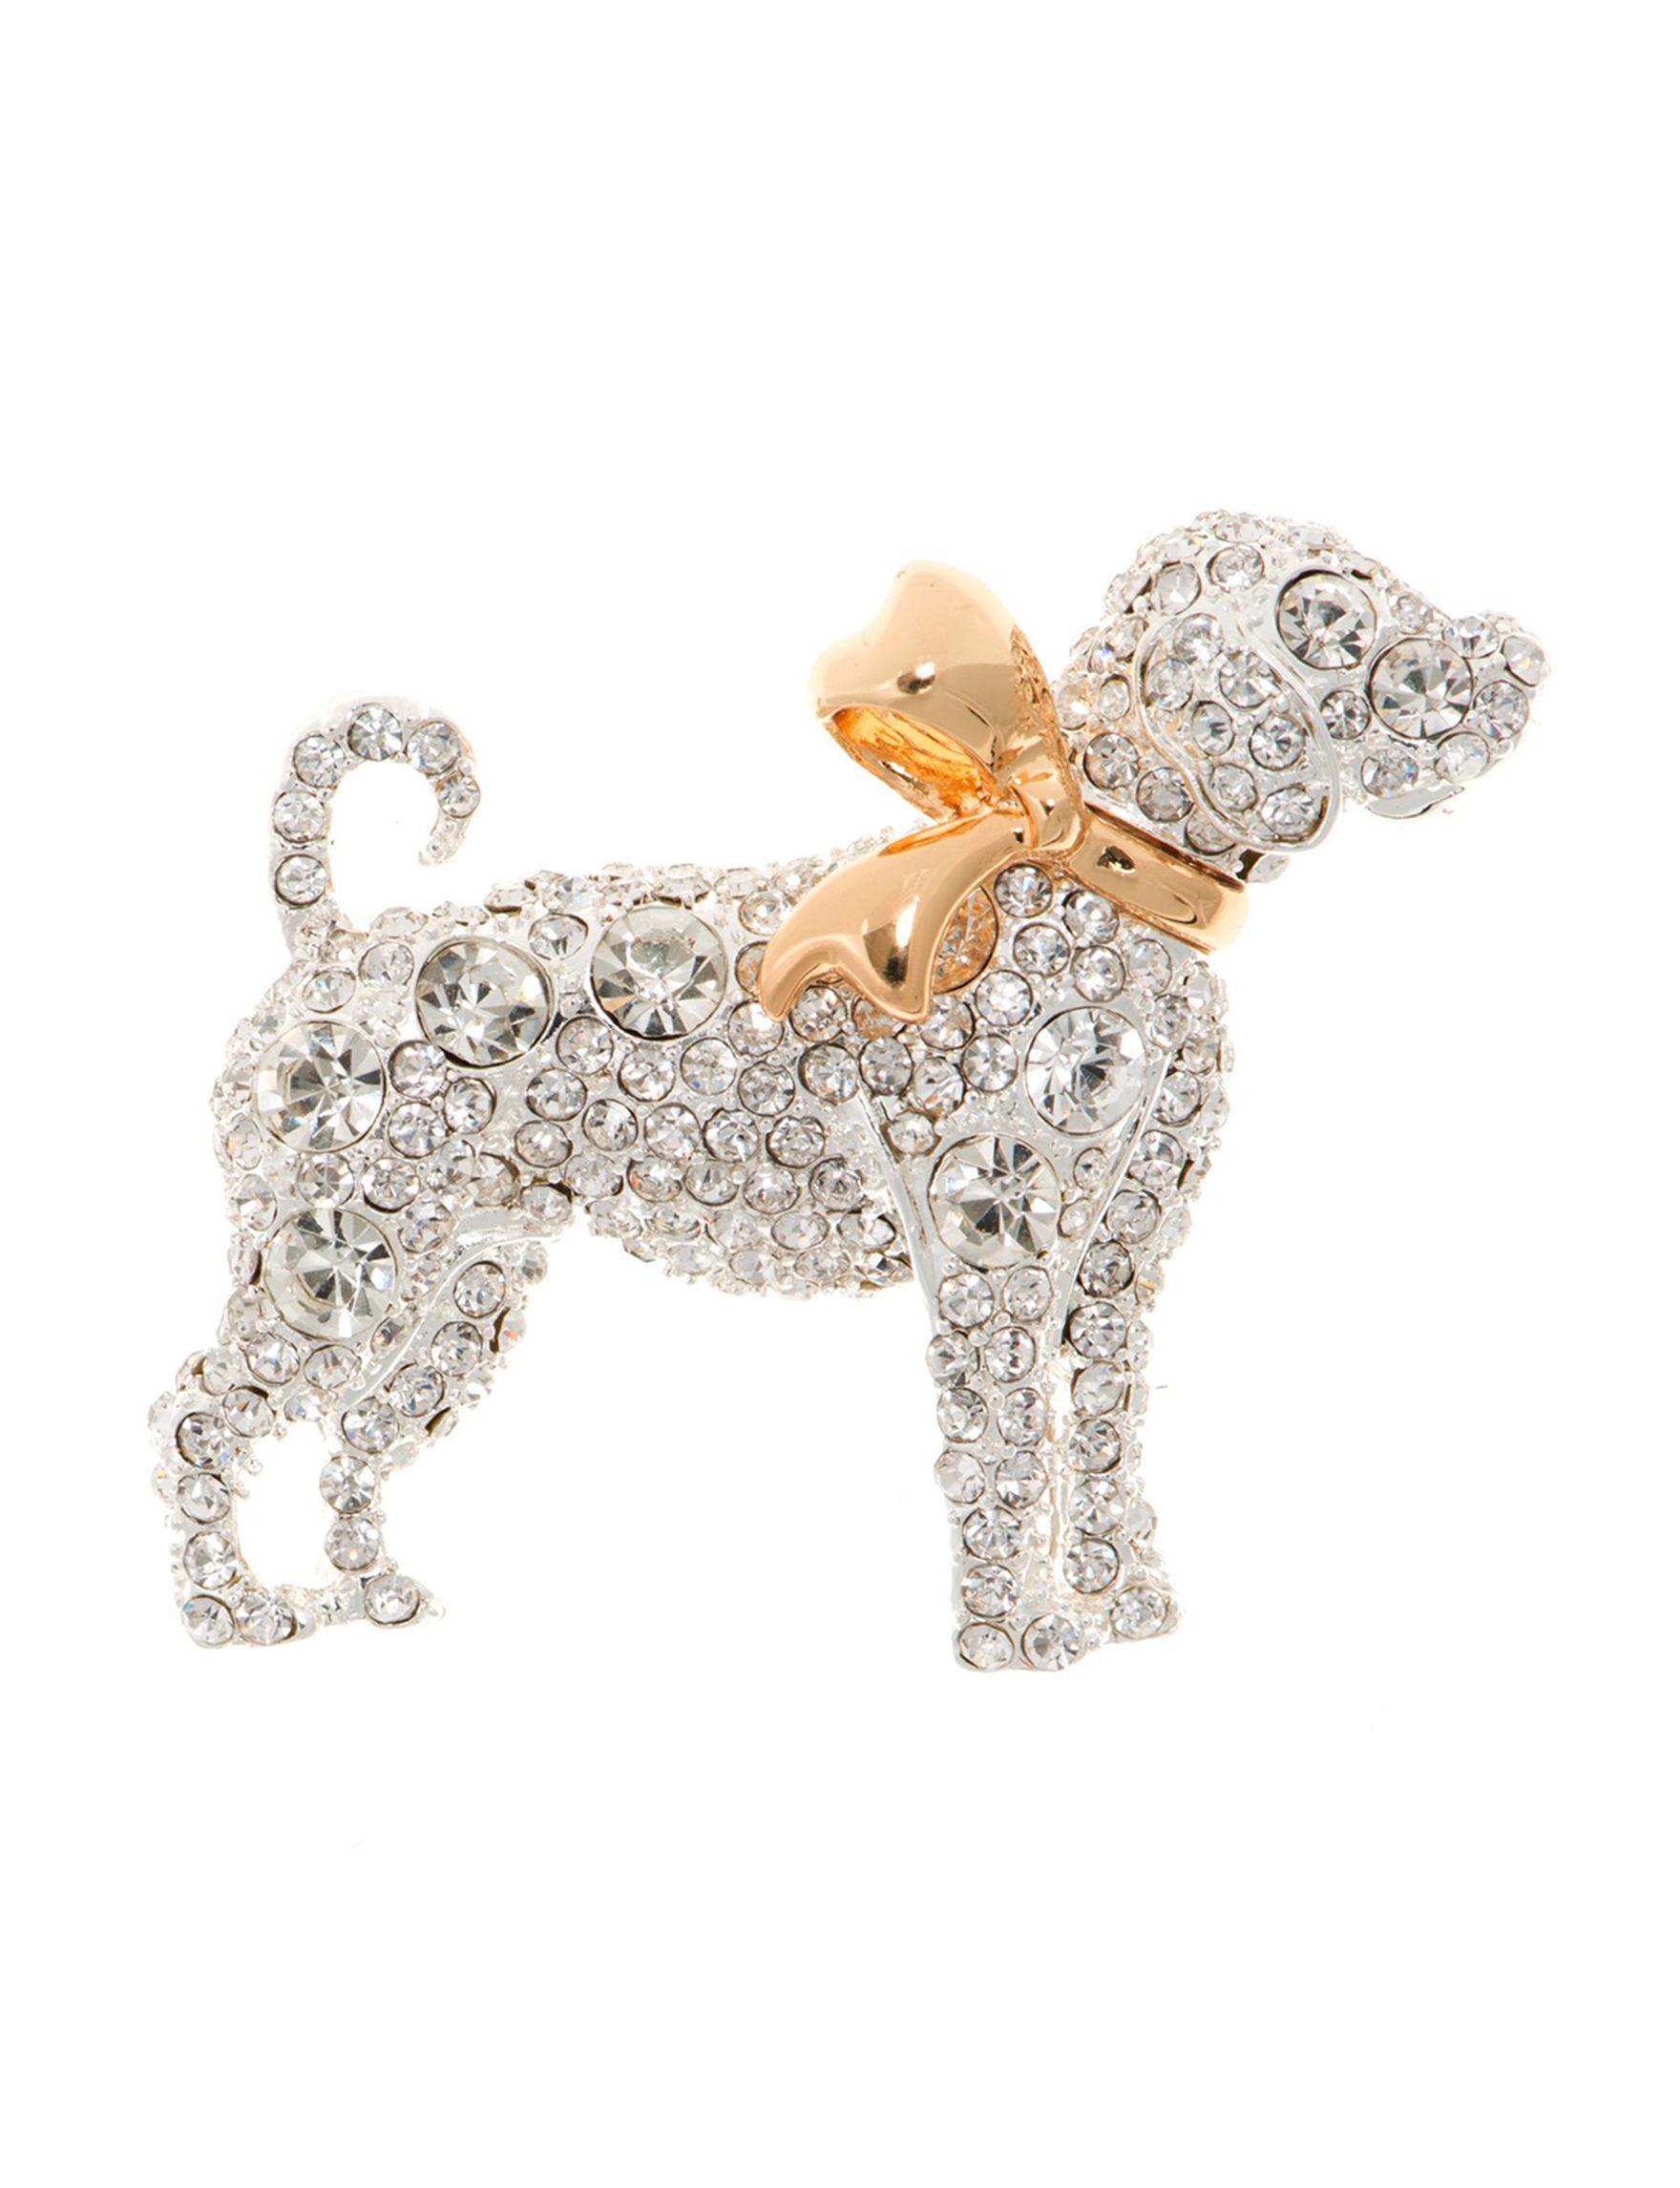 Pet Friends Silver / Gold Pins Fashion Jewelry